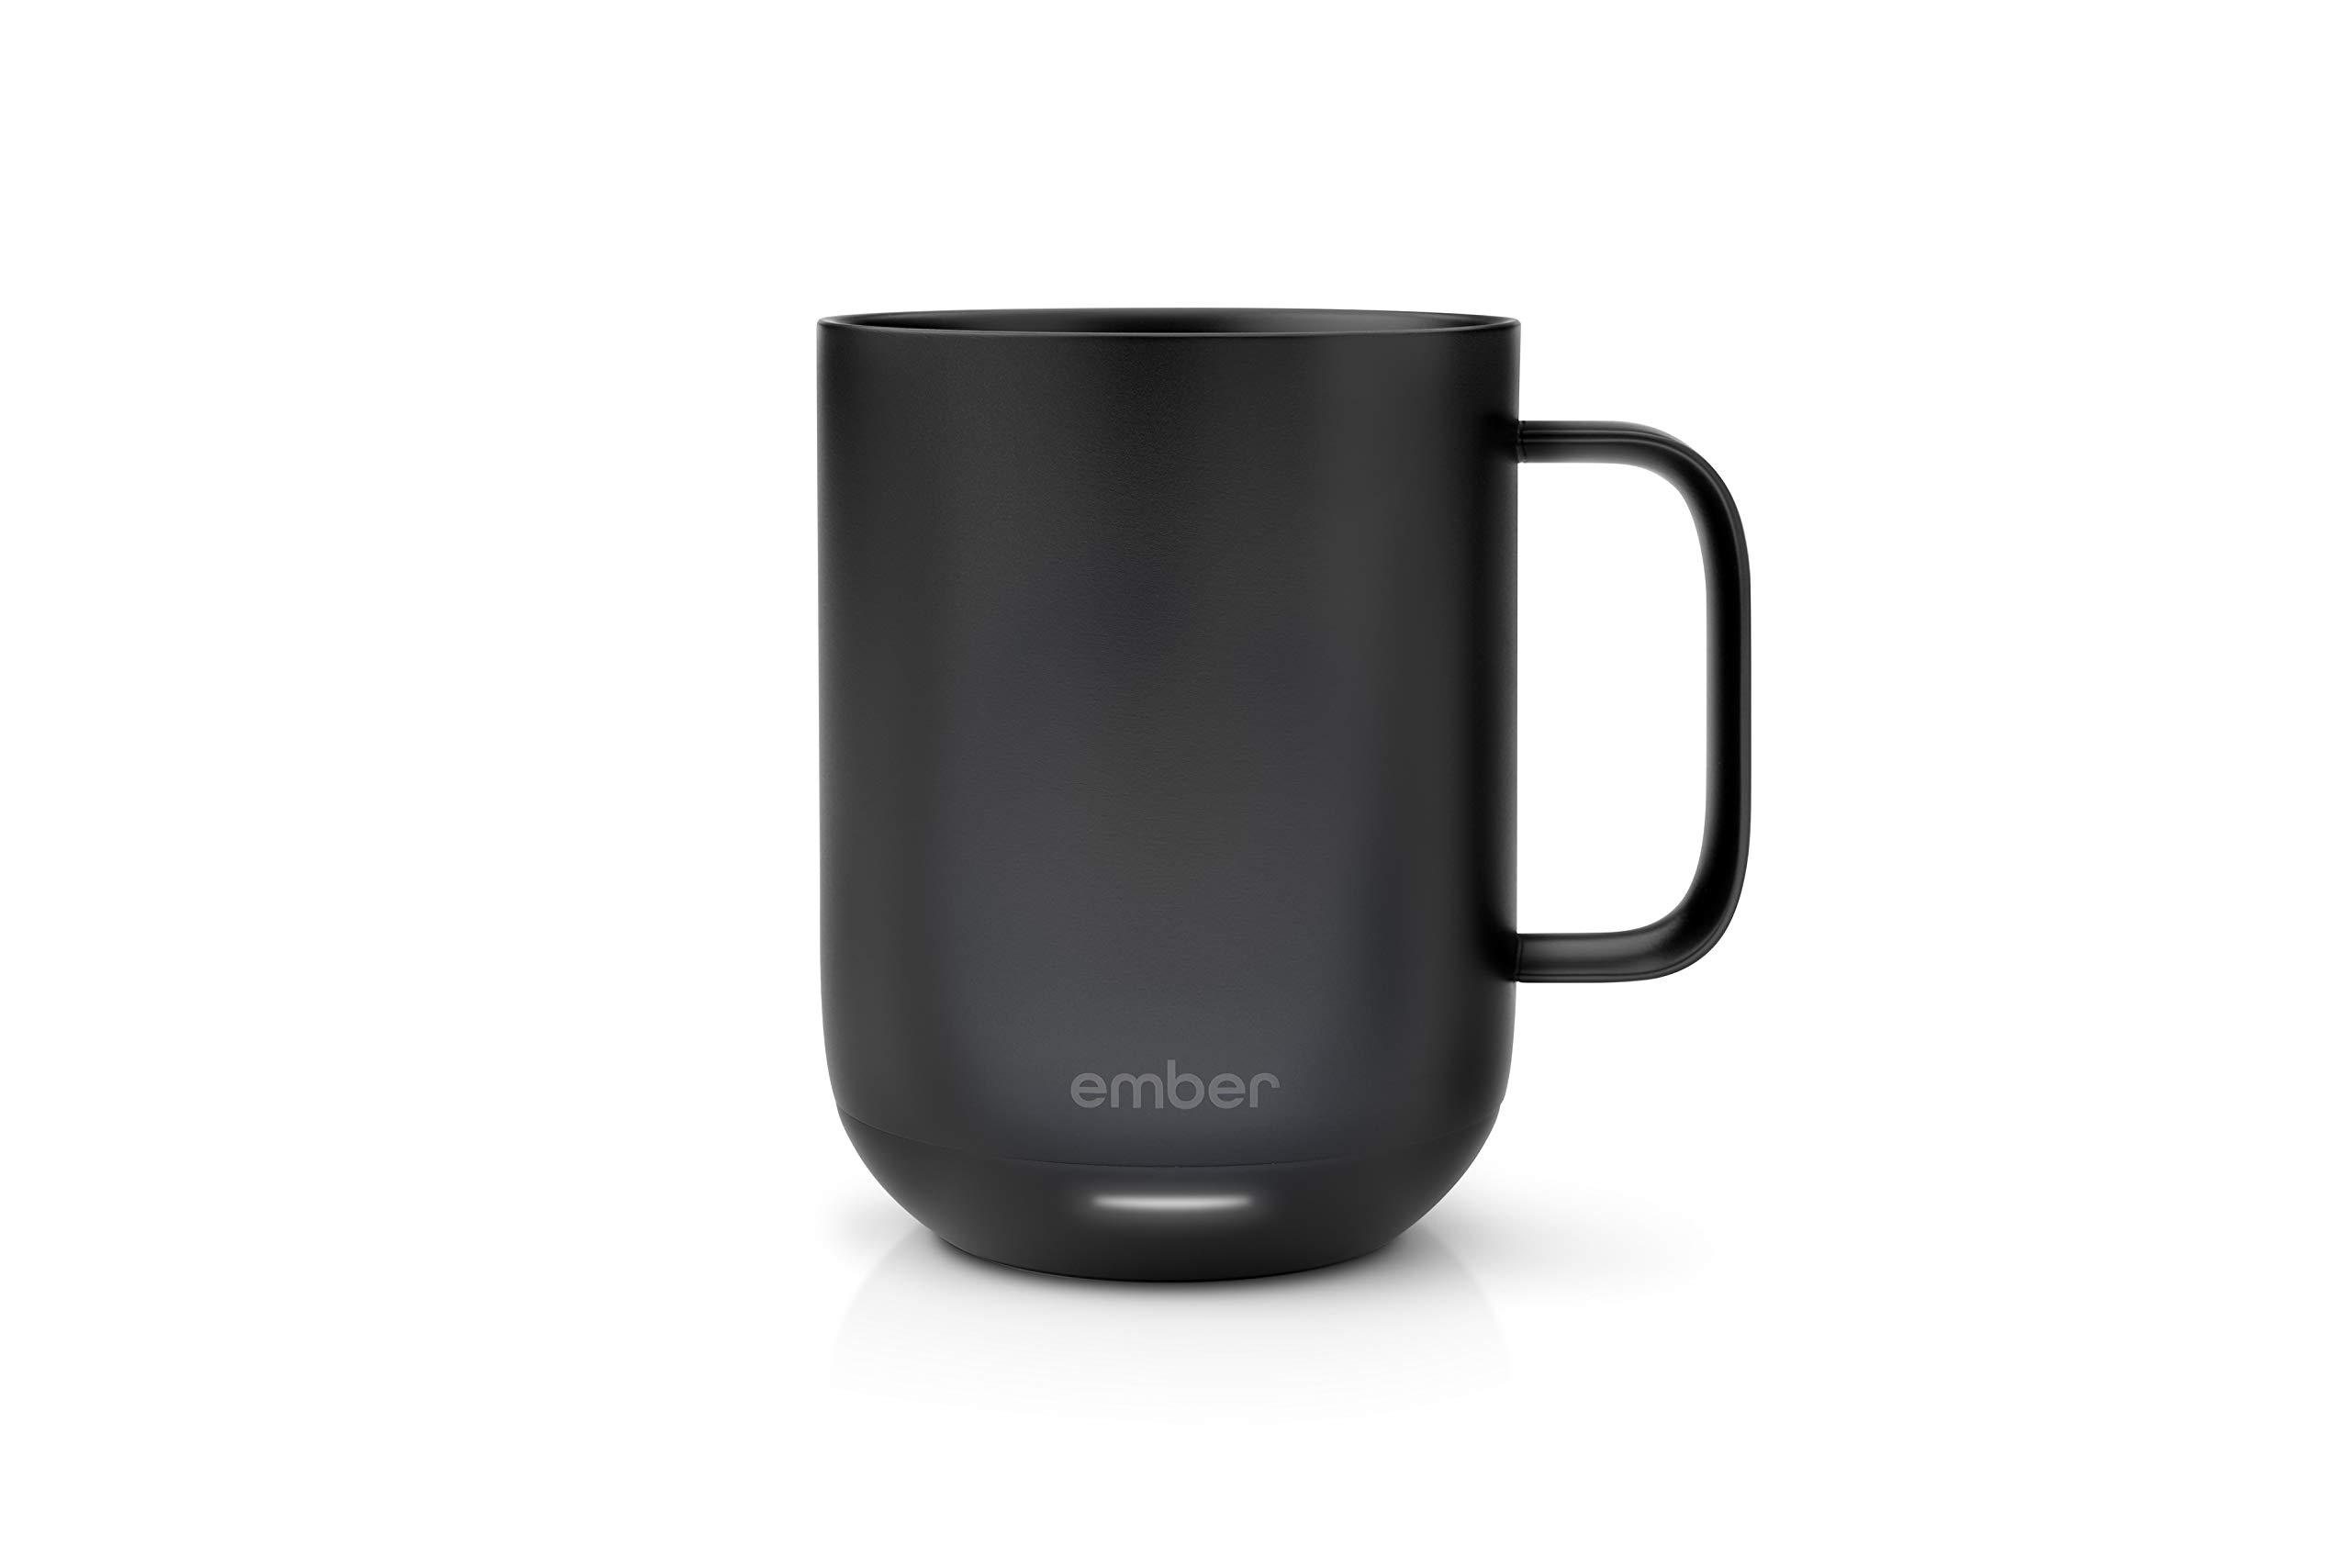 Ember (EMBFJ) CM171000US Temperature Control Ceramic Mug, One Size, Black